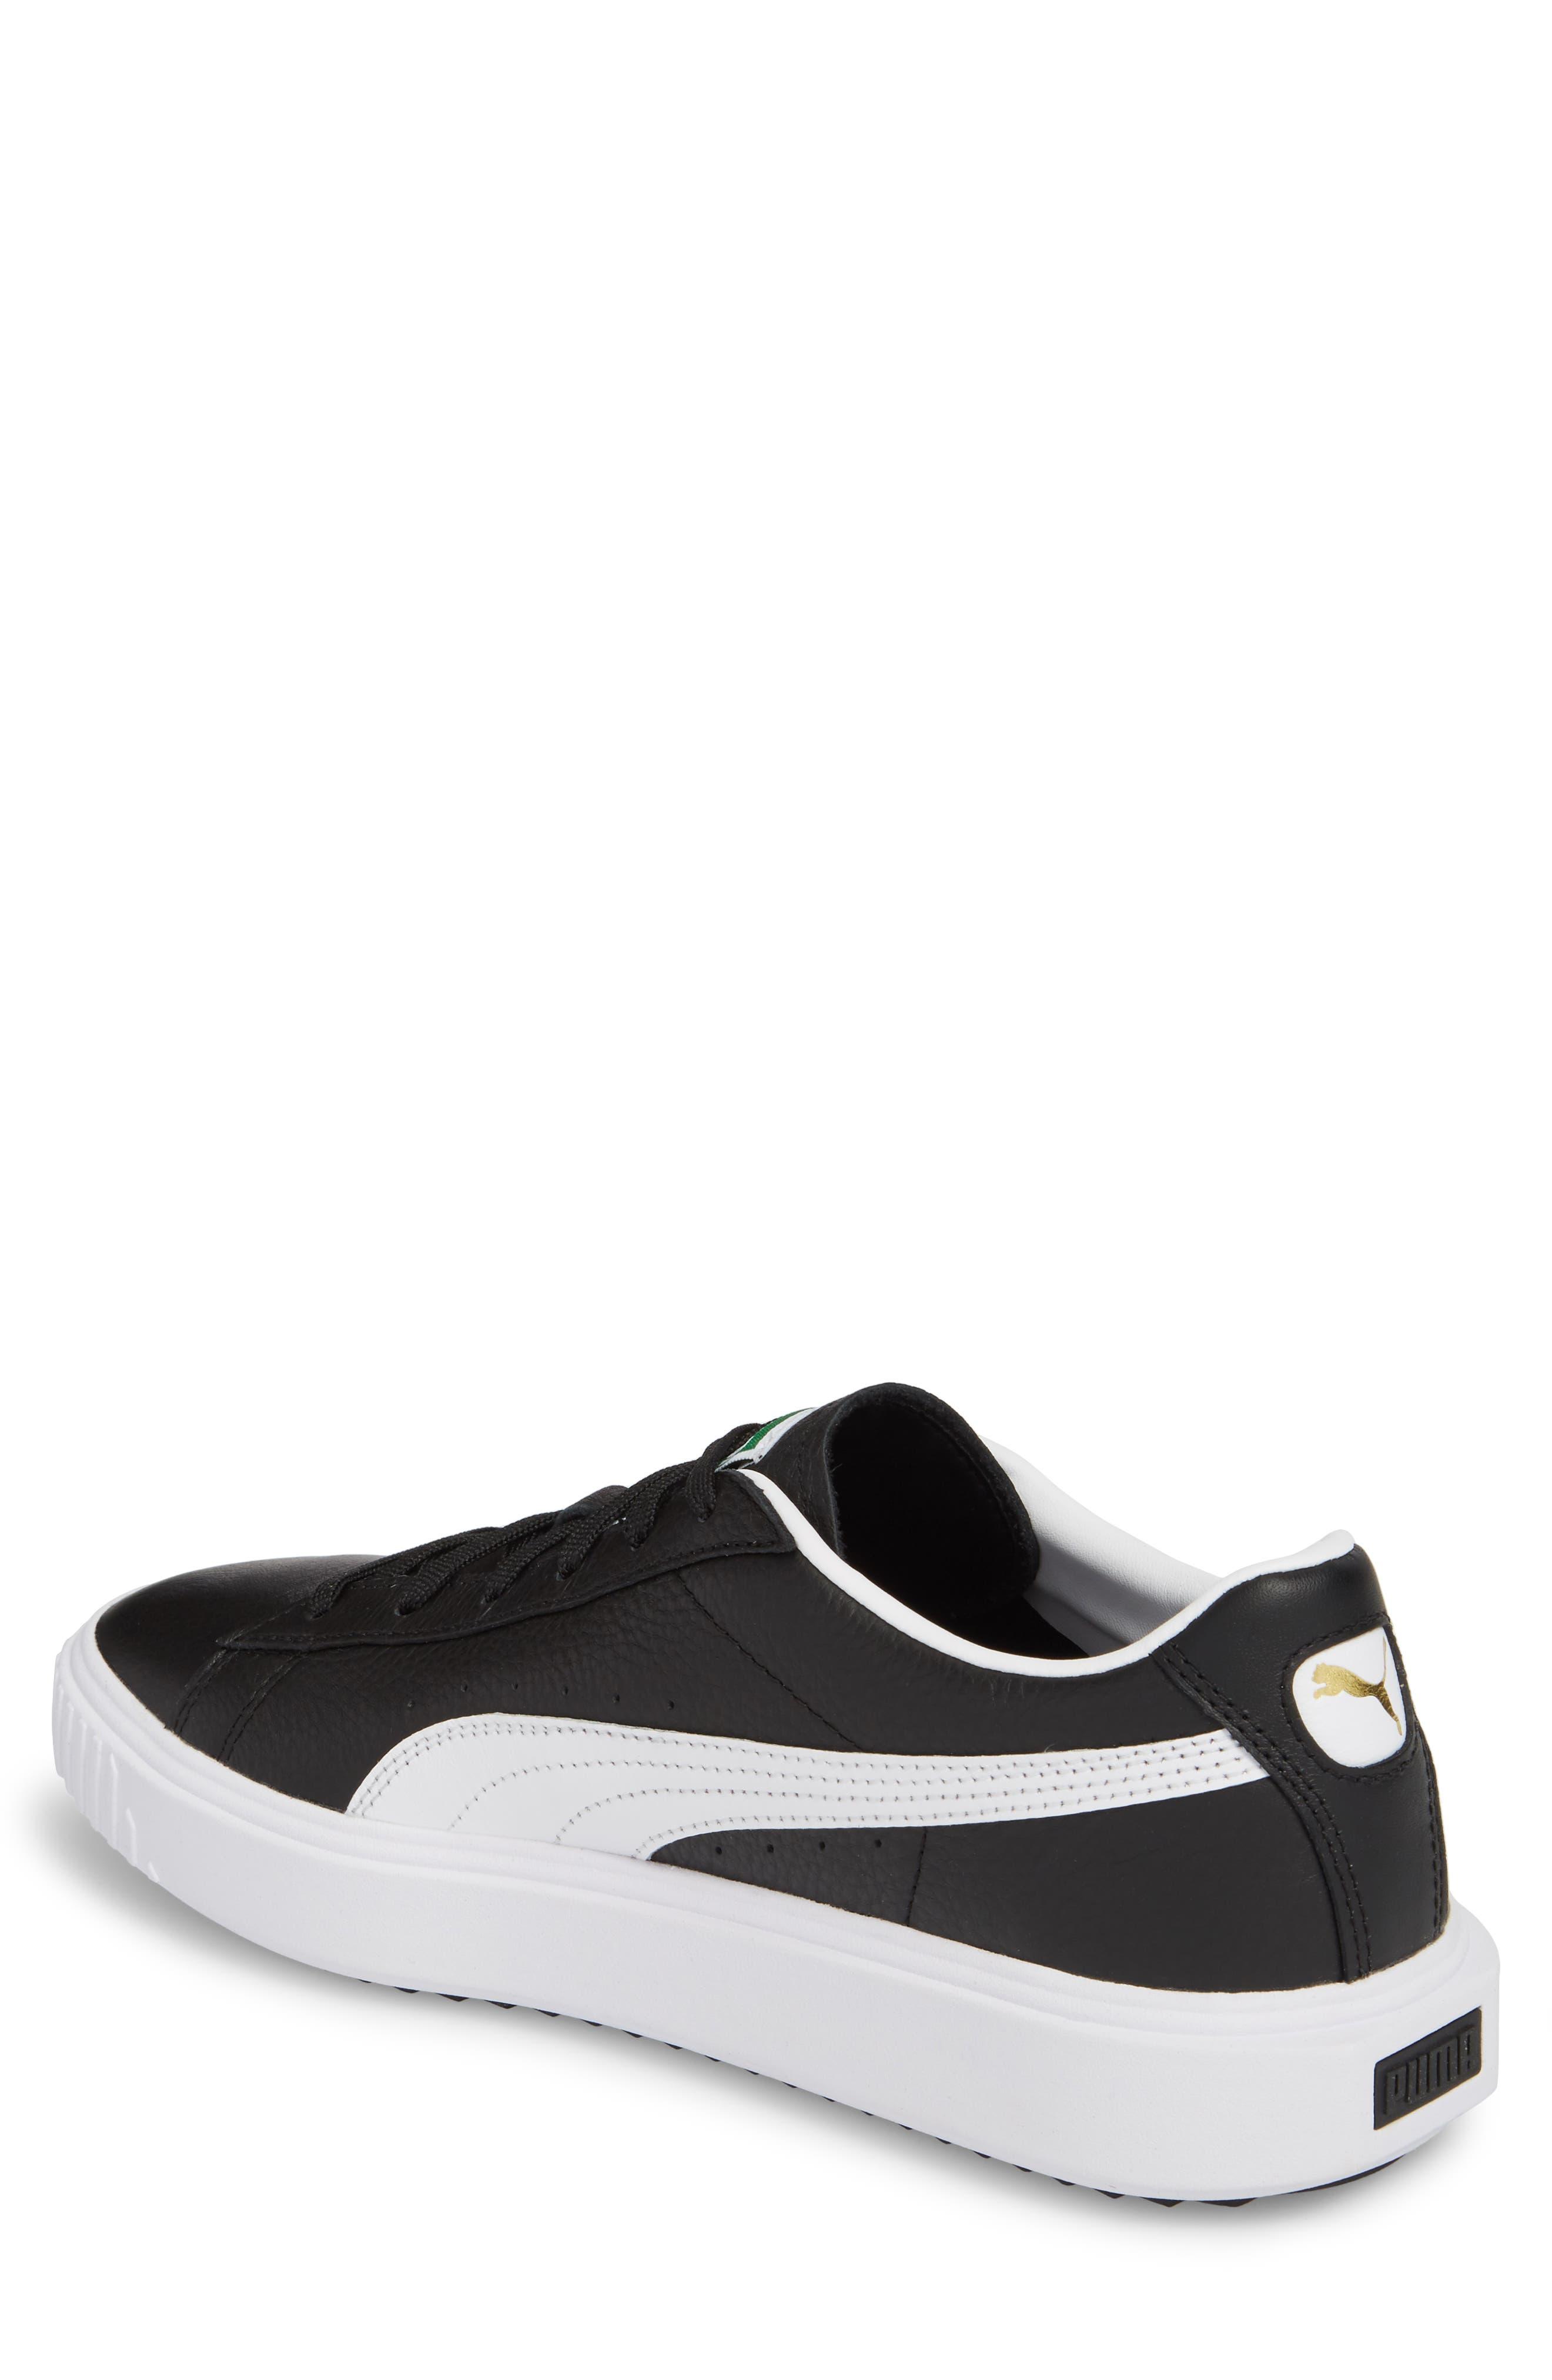 Alternate Image 2  - PUMA Breaker Low Top Sneaker (Men)